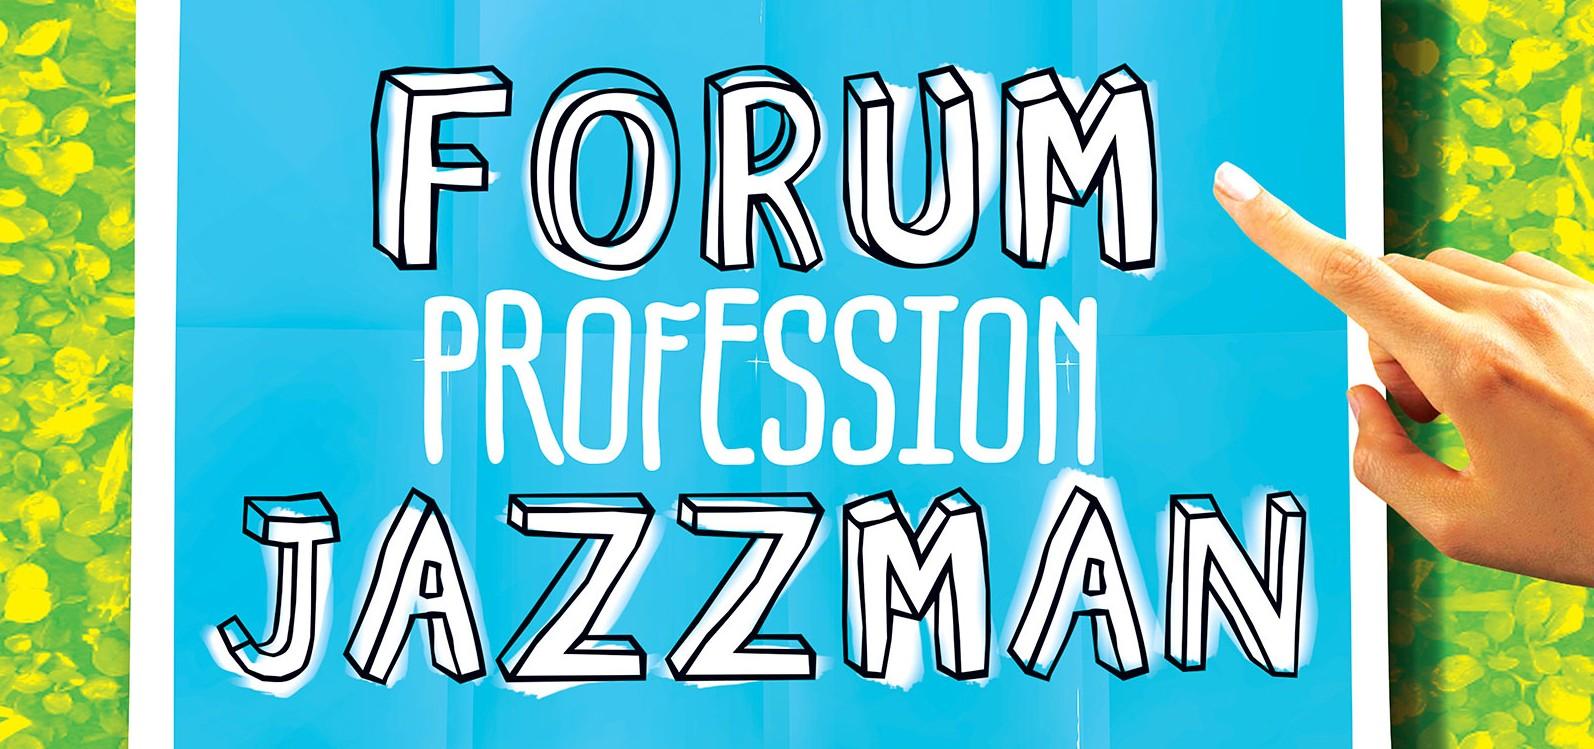 Profession-Jazzman-visuel